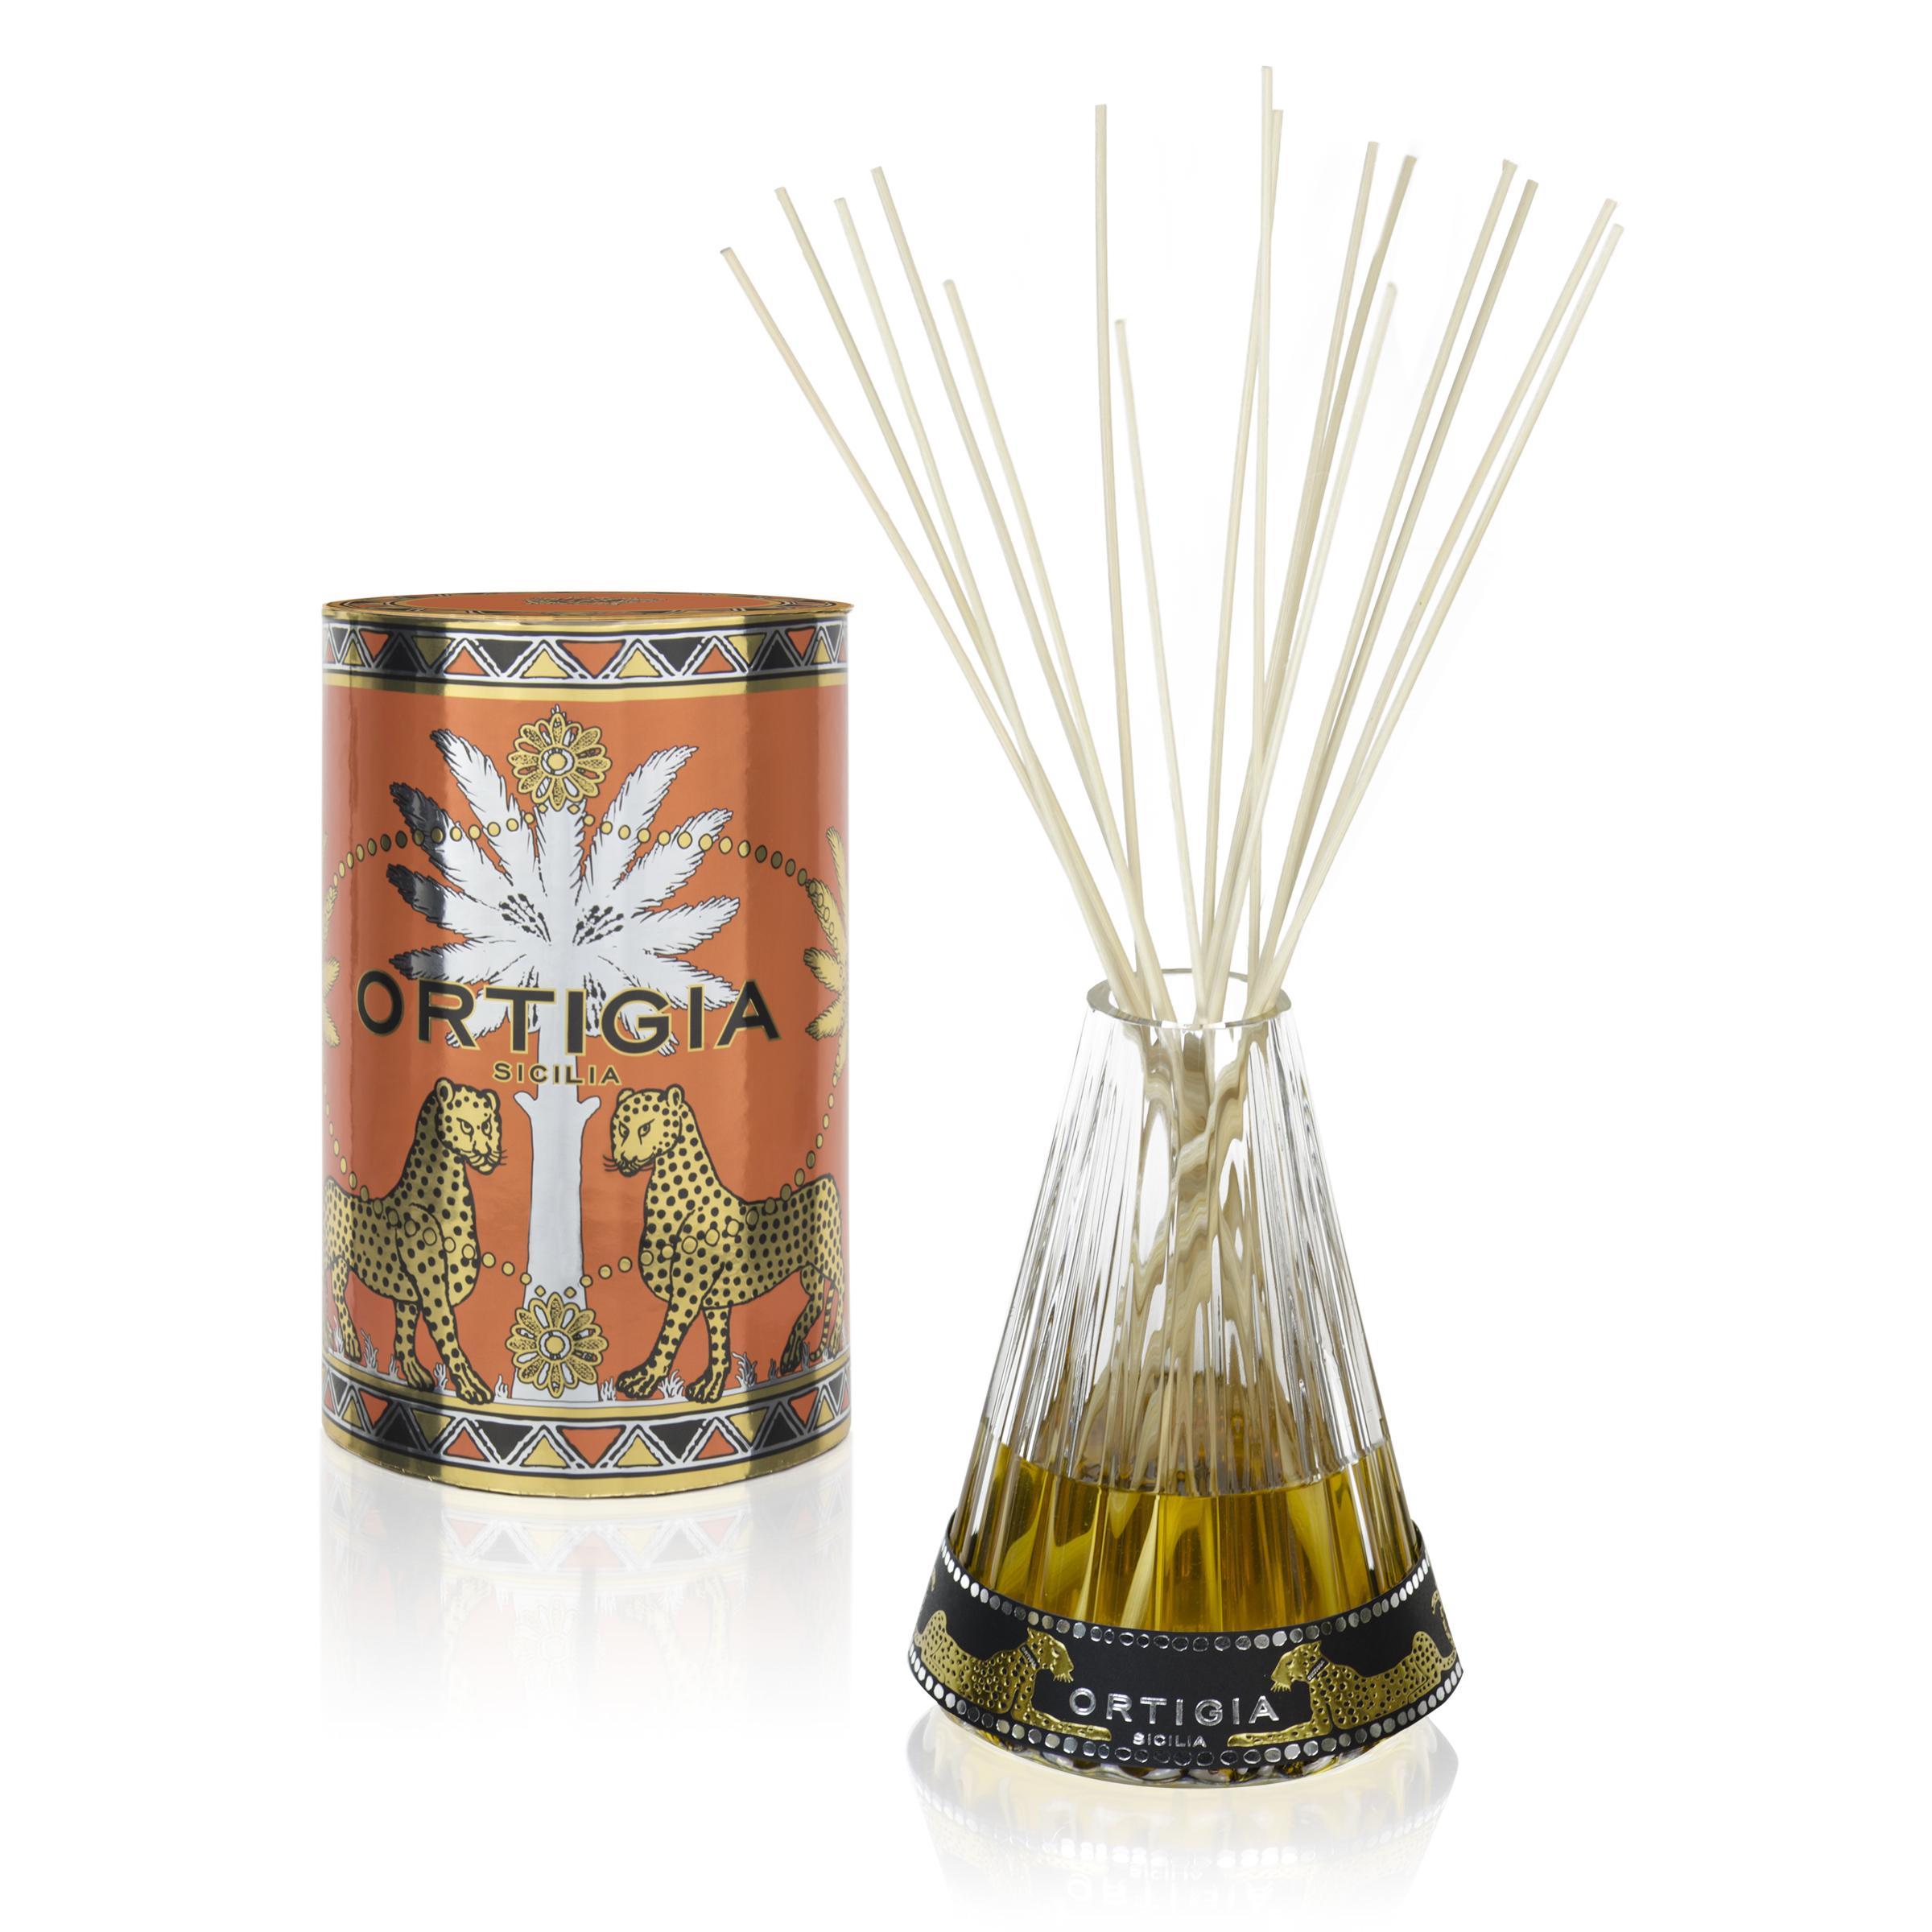 ORTIGIA Ambra Nera Perfume Diffuser Onda 500ml